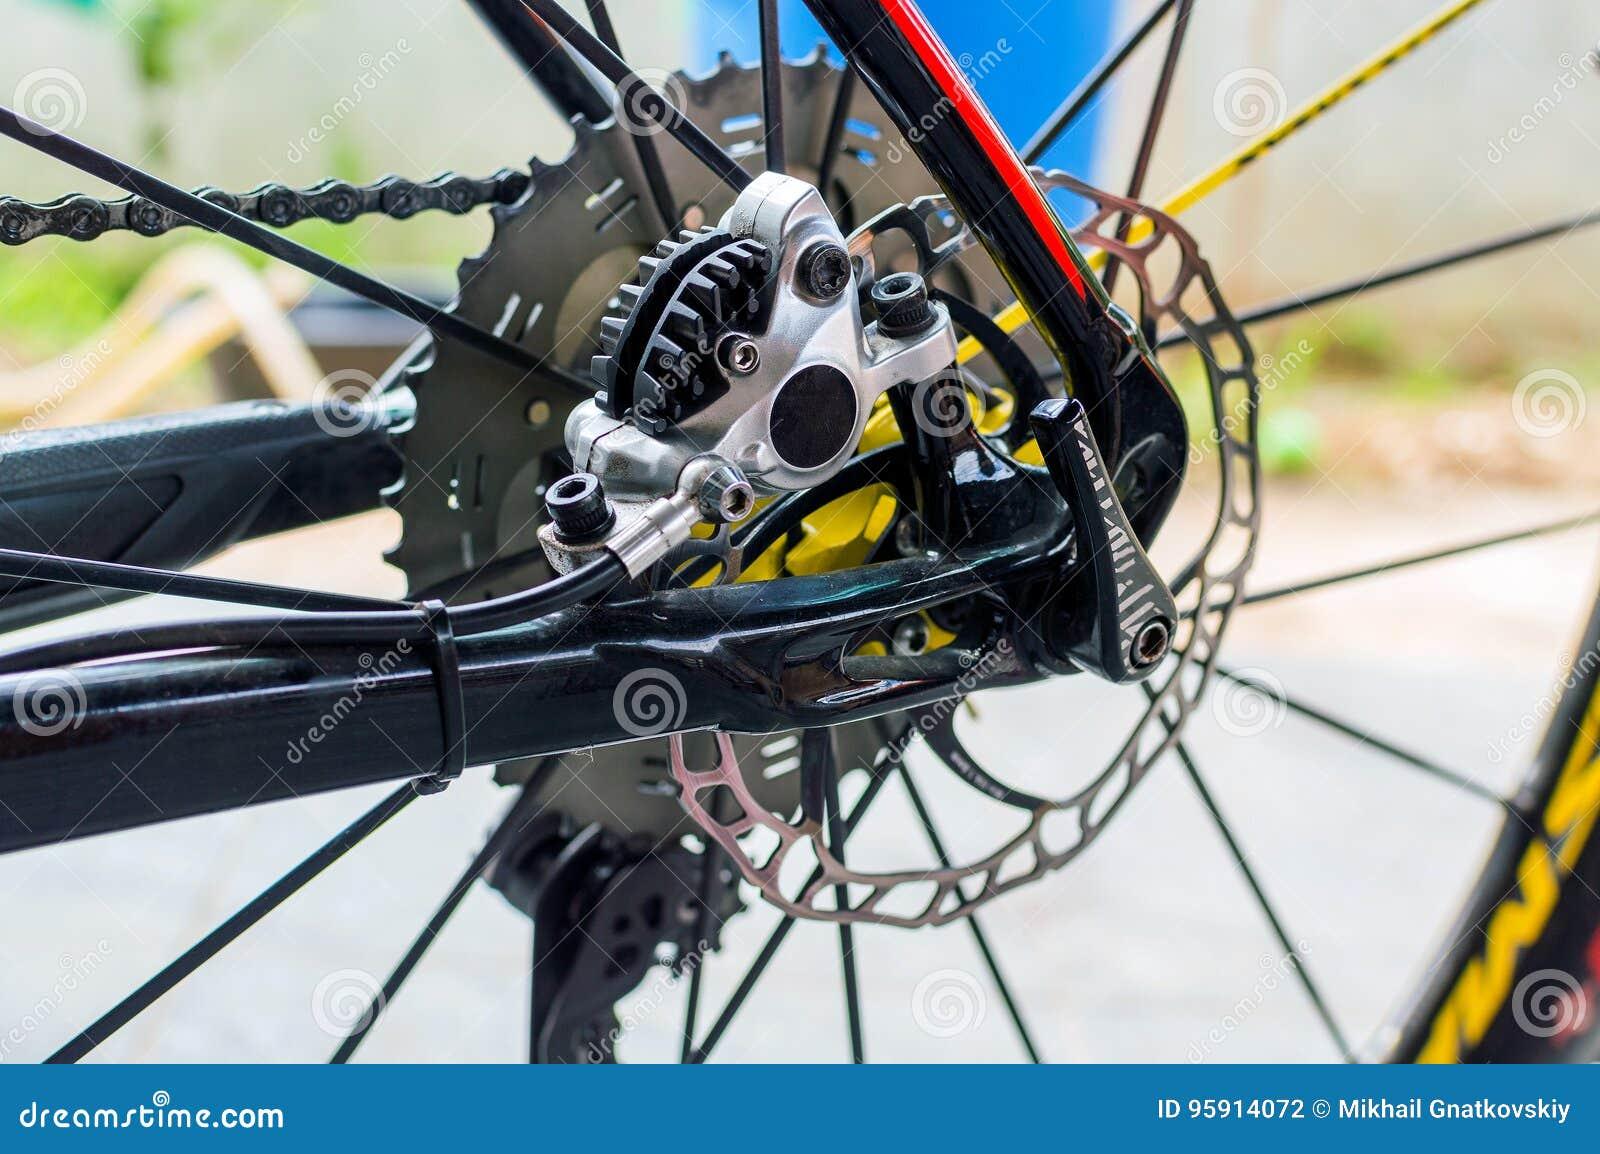 Bicycle Hydraulic Rear Disk Brake On Sport Bike Edition Stock Photo